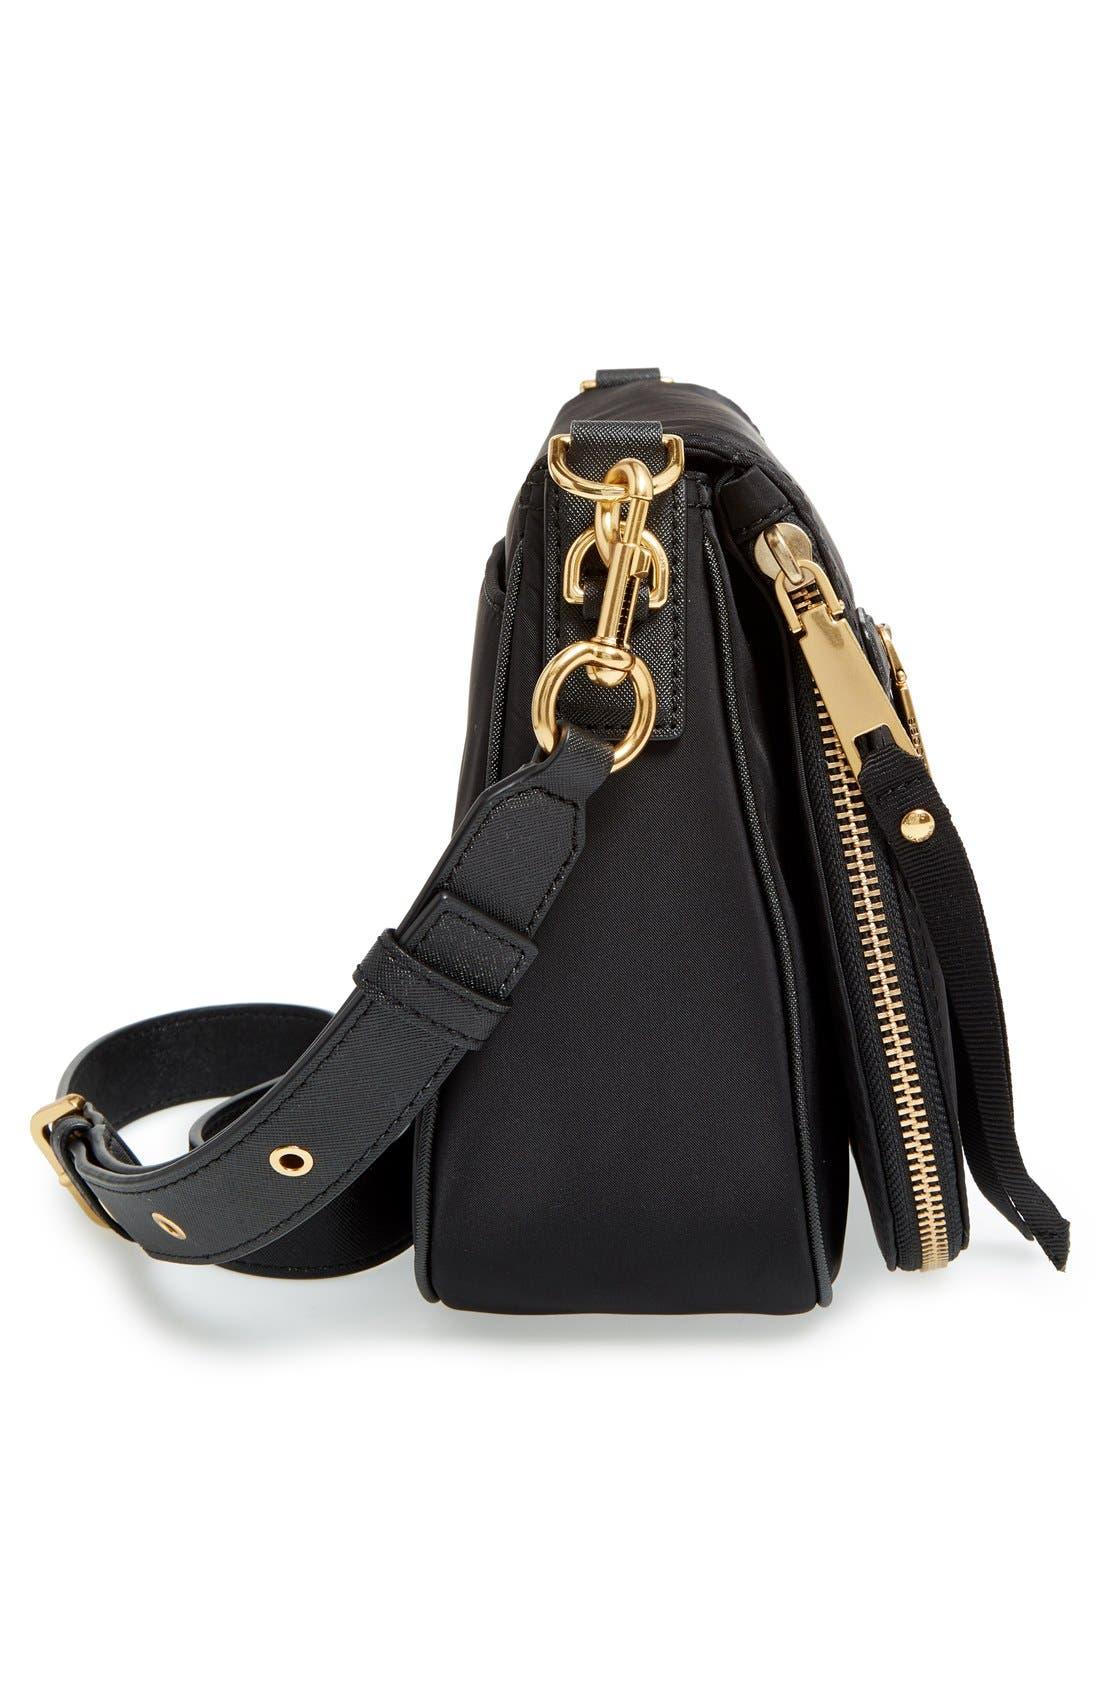 Trooper Nomad Nylon Saddle Bag,                             Alternate thumbnail 5, color,                             Black